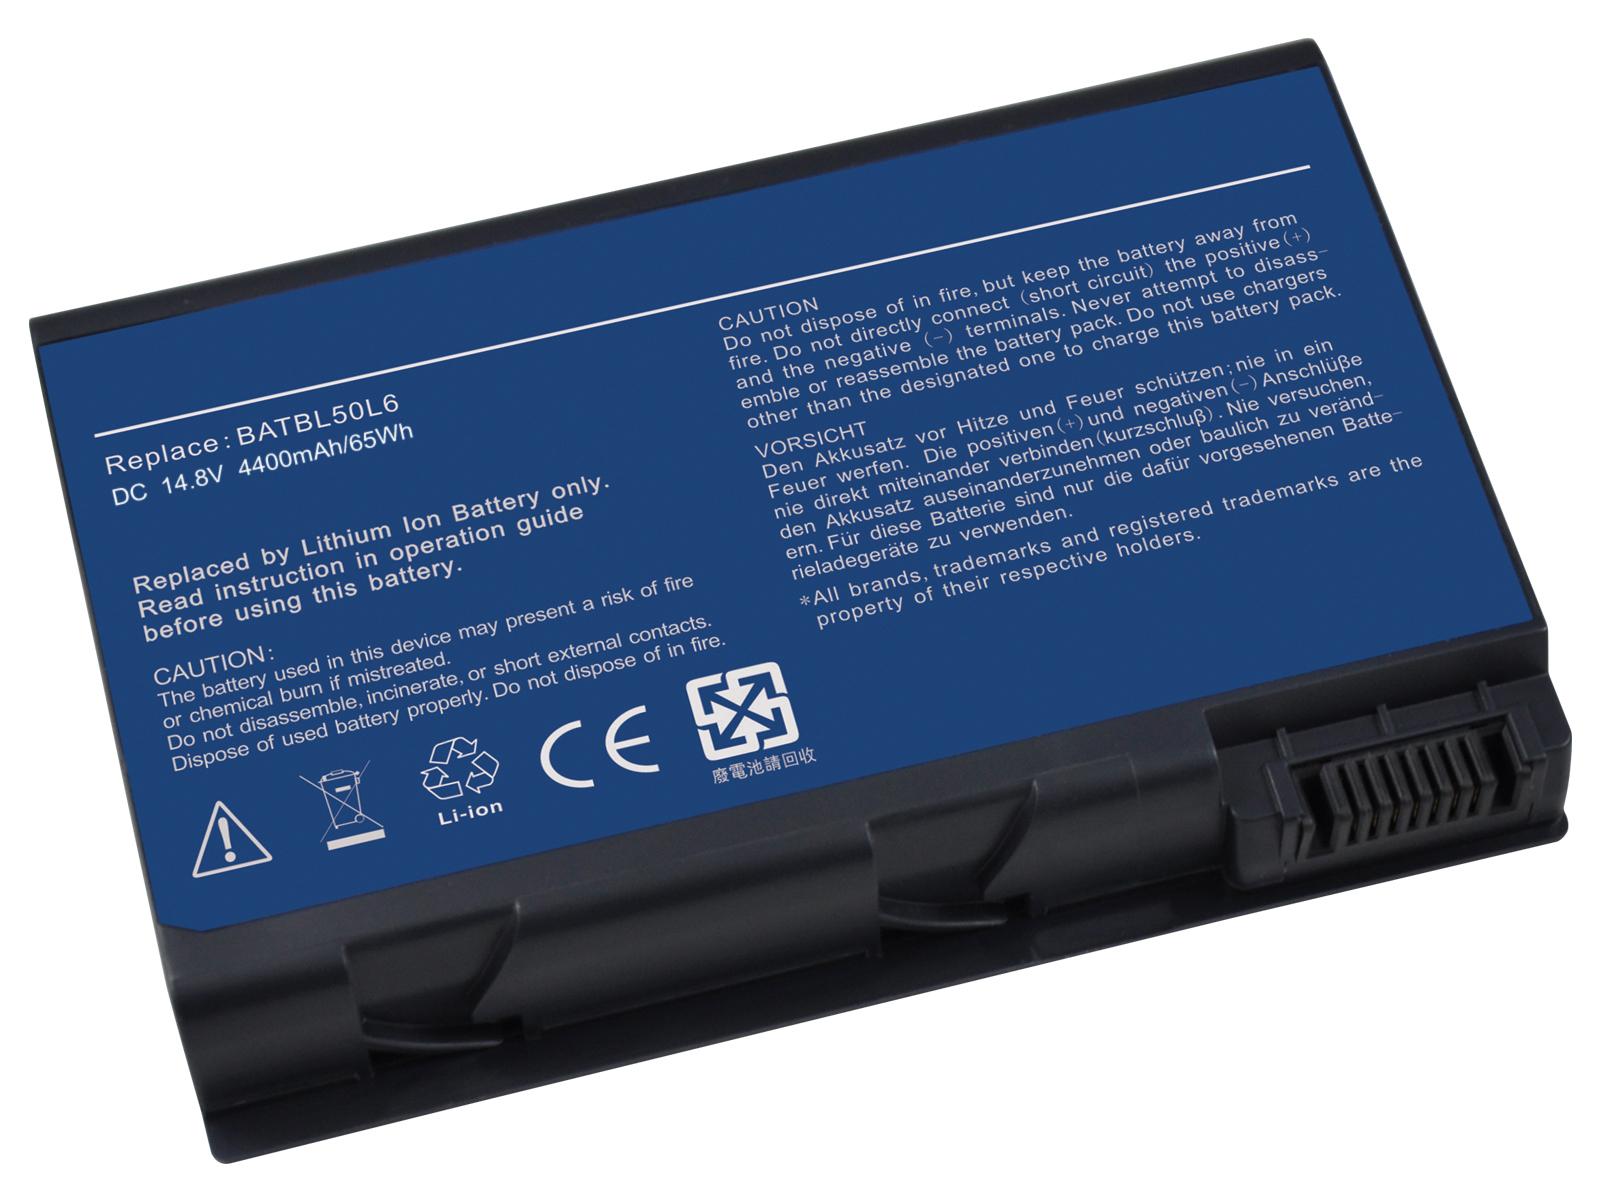 Аккумулятор Acer BATBL50L6 11.V 4400mAh Aspire 3100 5100 5610 5630